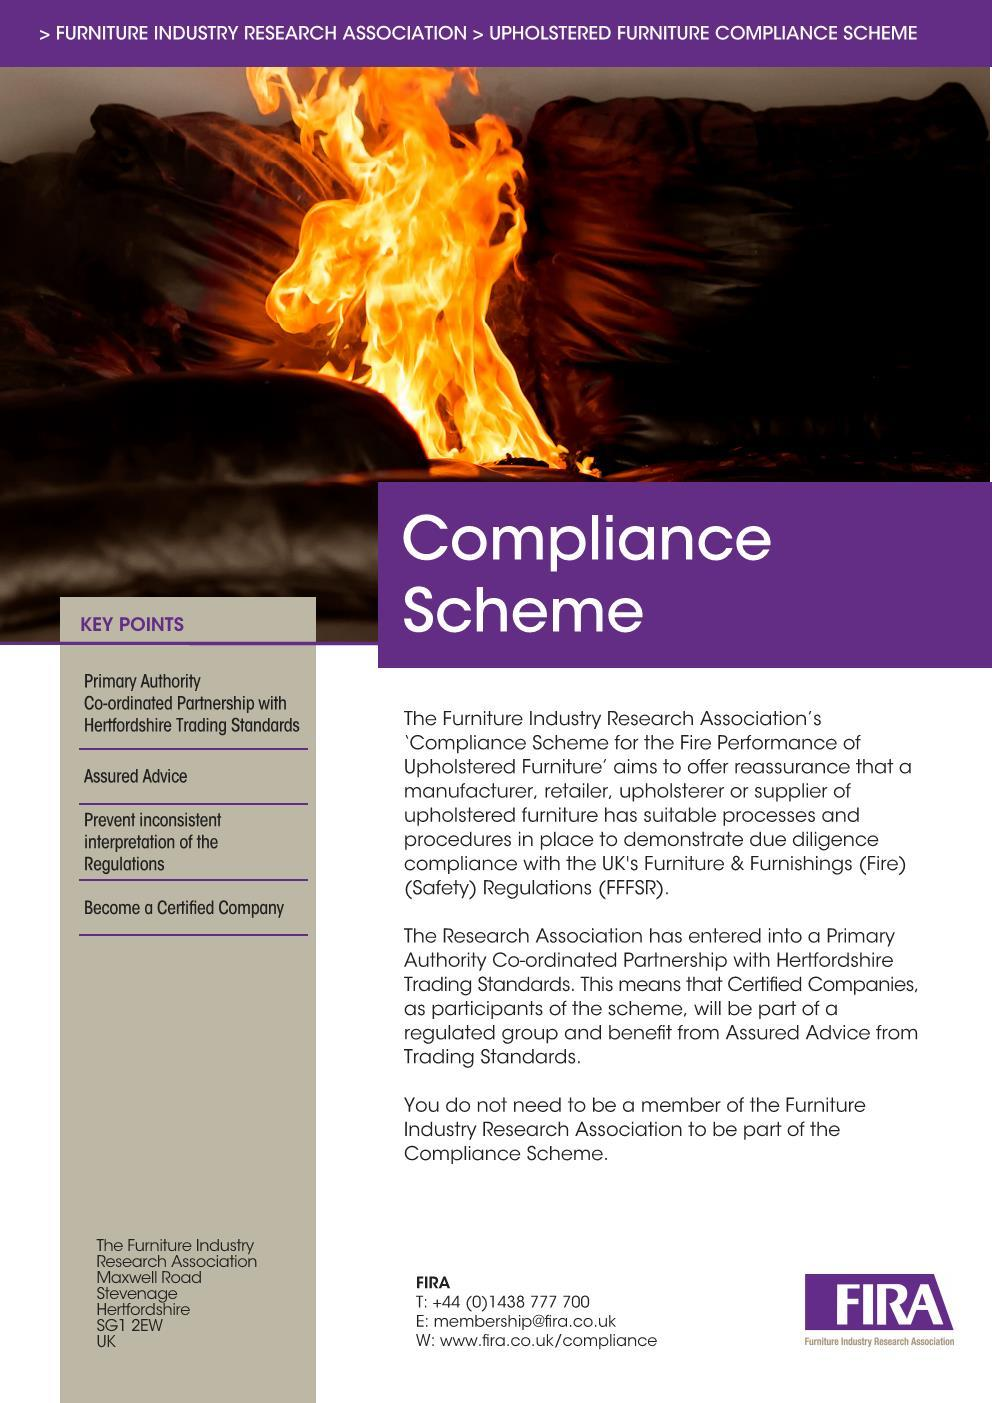 Compliance-scheme-leaflet-image_180112_110534.jpg#asset:257525